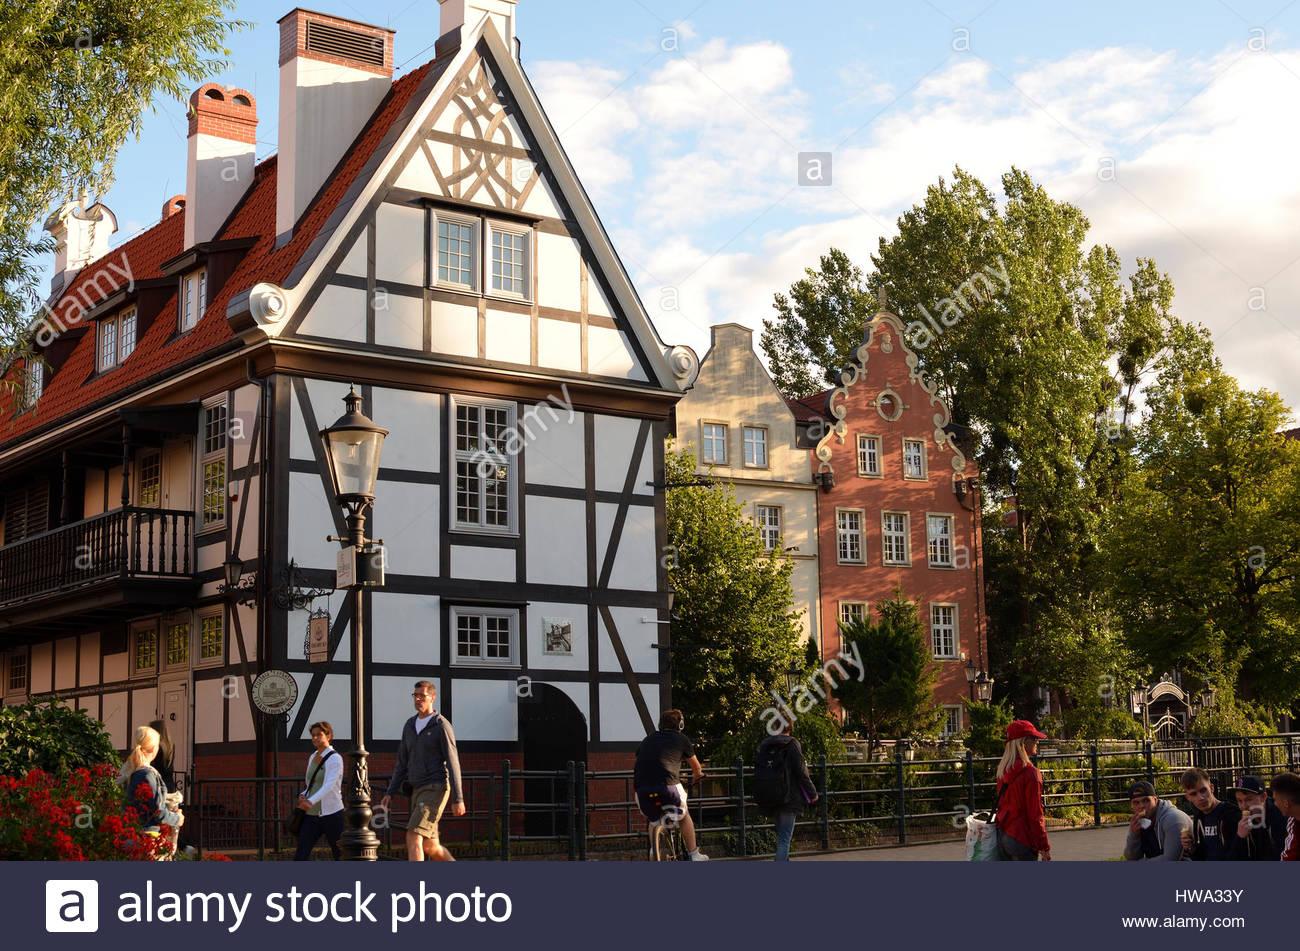 Gdansk Chocolate Mill / Czekoladowy Mlyn, Old Town / Stare Miasto, Poland - Stock Image